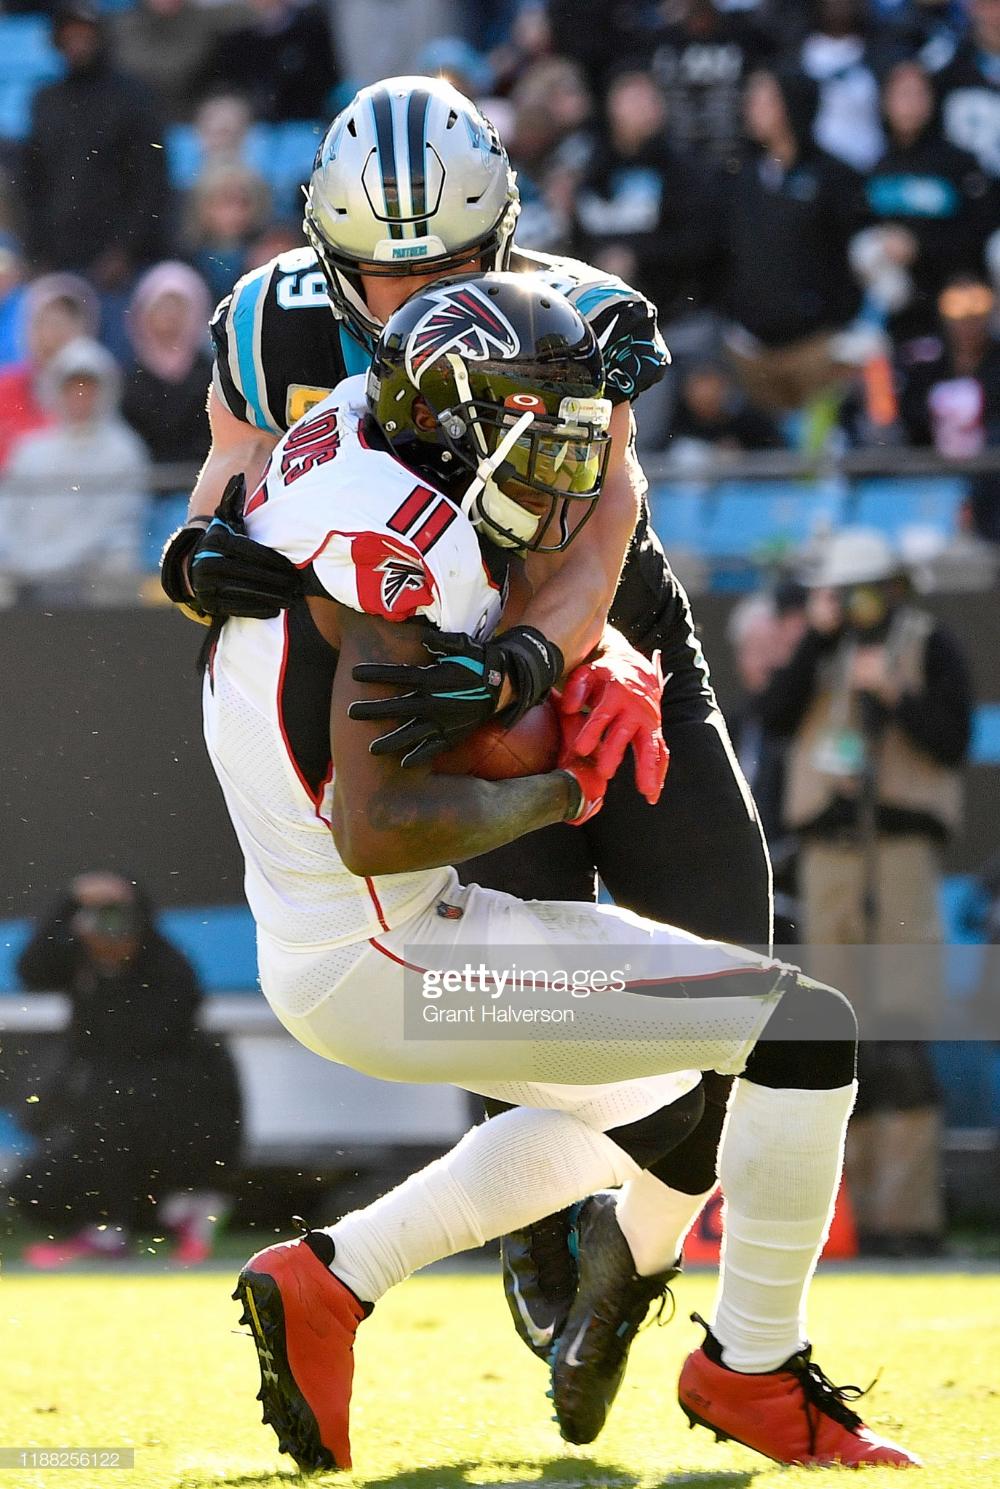 Julio Jones Of The Atlanta Falcons Makes A Catch Against Luke Kuechly Atlanta Falcons Luke Kuechly Julio Jones